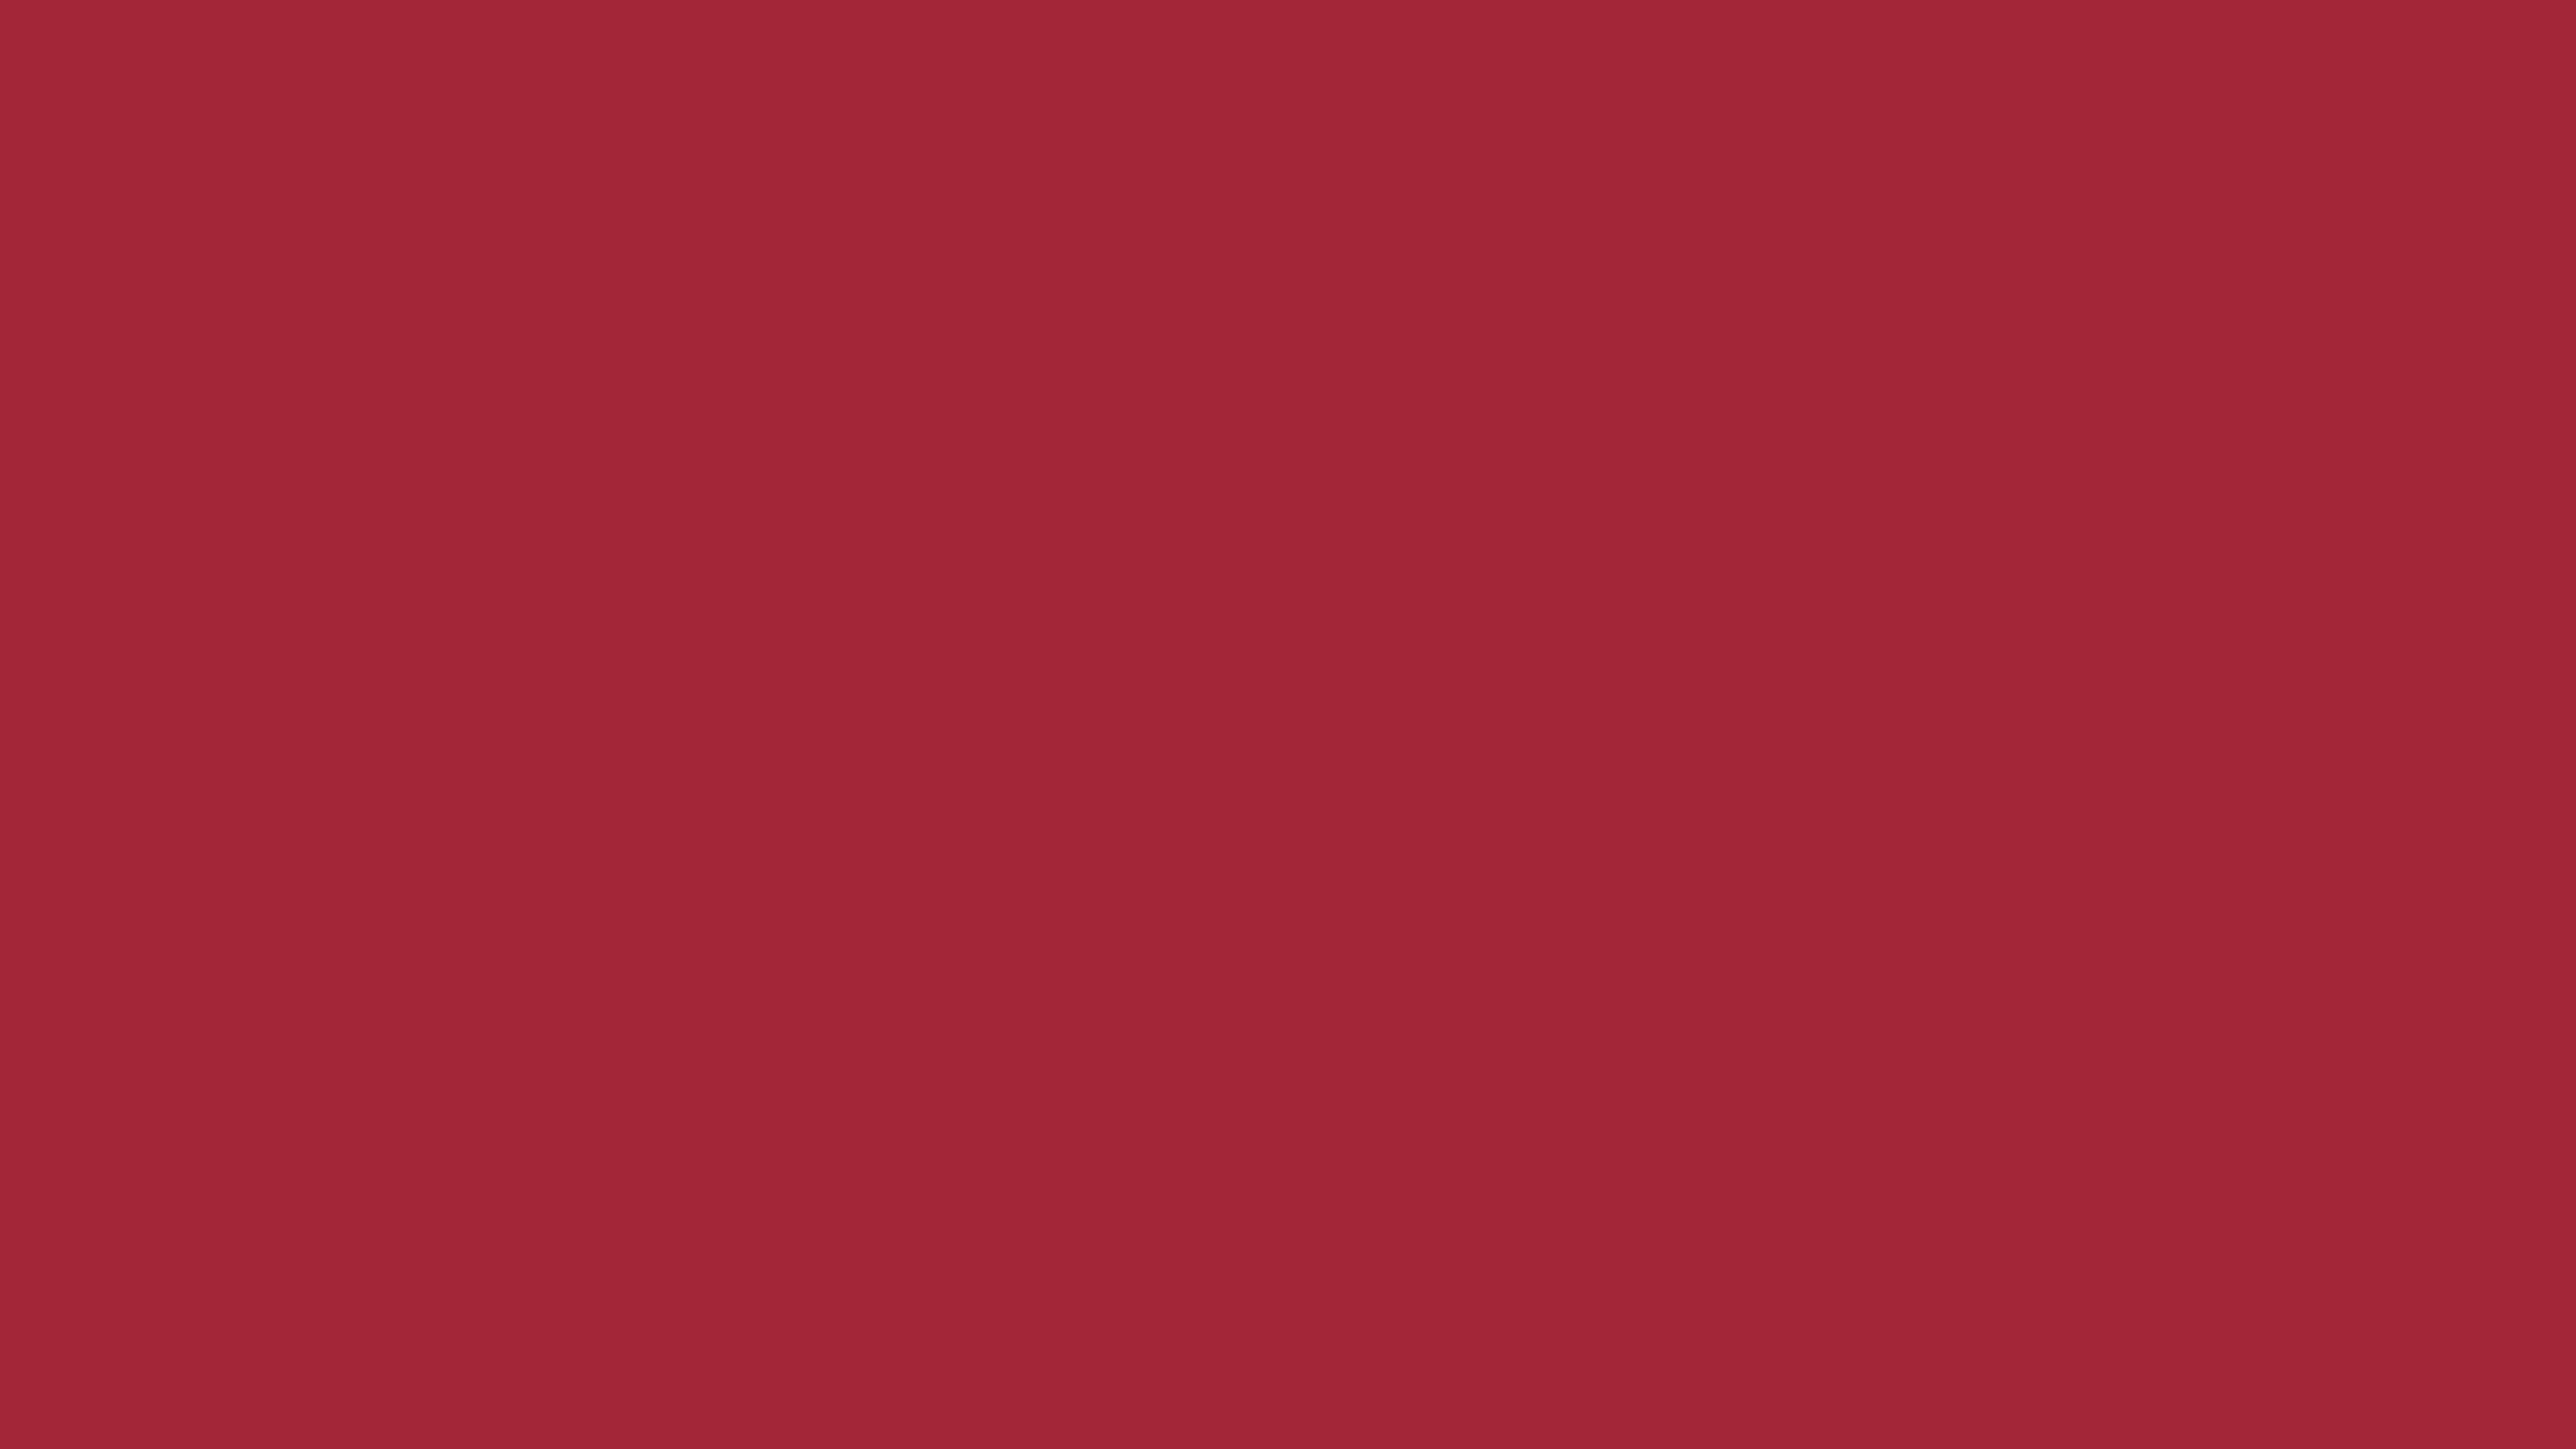 3840x2160 Alabama Crimson Solid Color Background